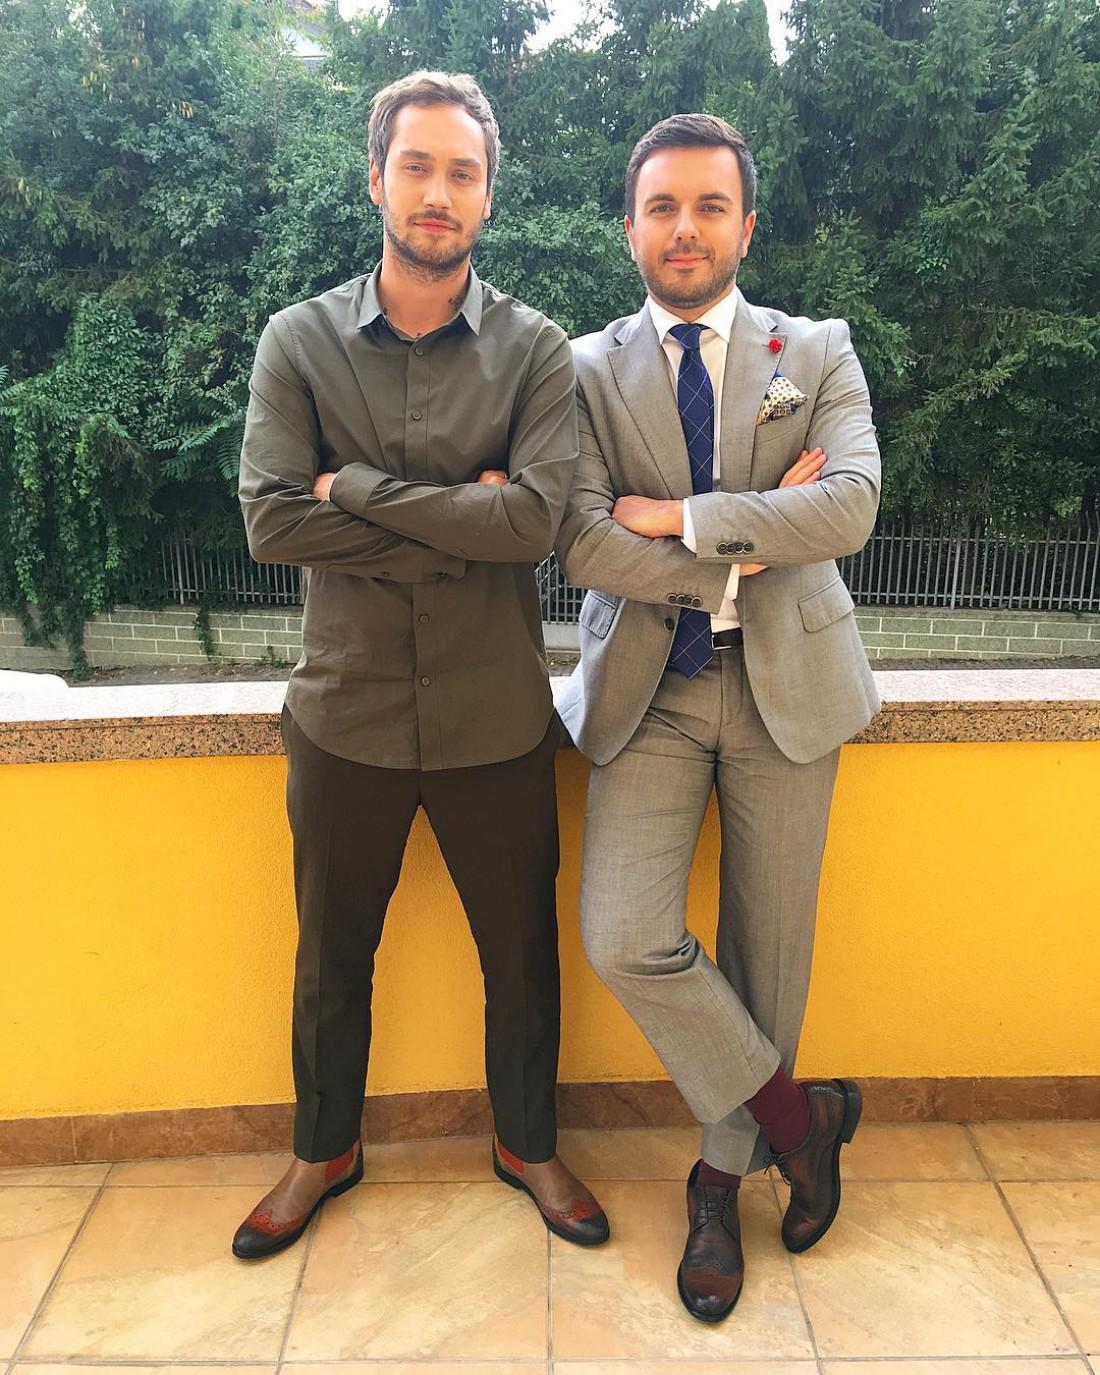 Рожден Ансуи и Григорий Решетник на съемках шоу Холостяк